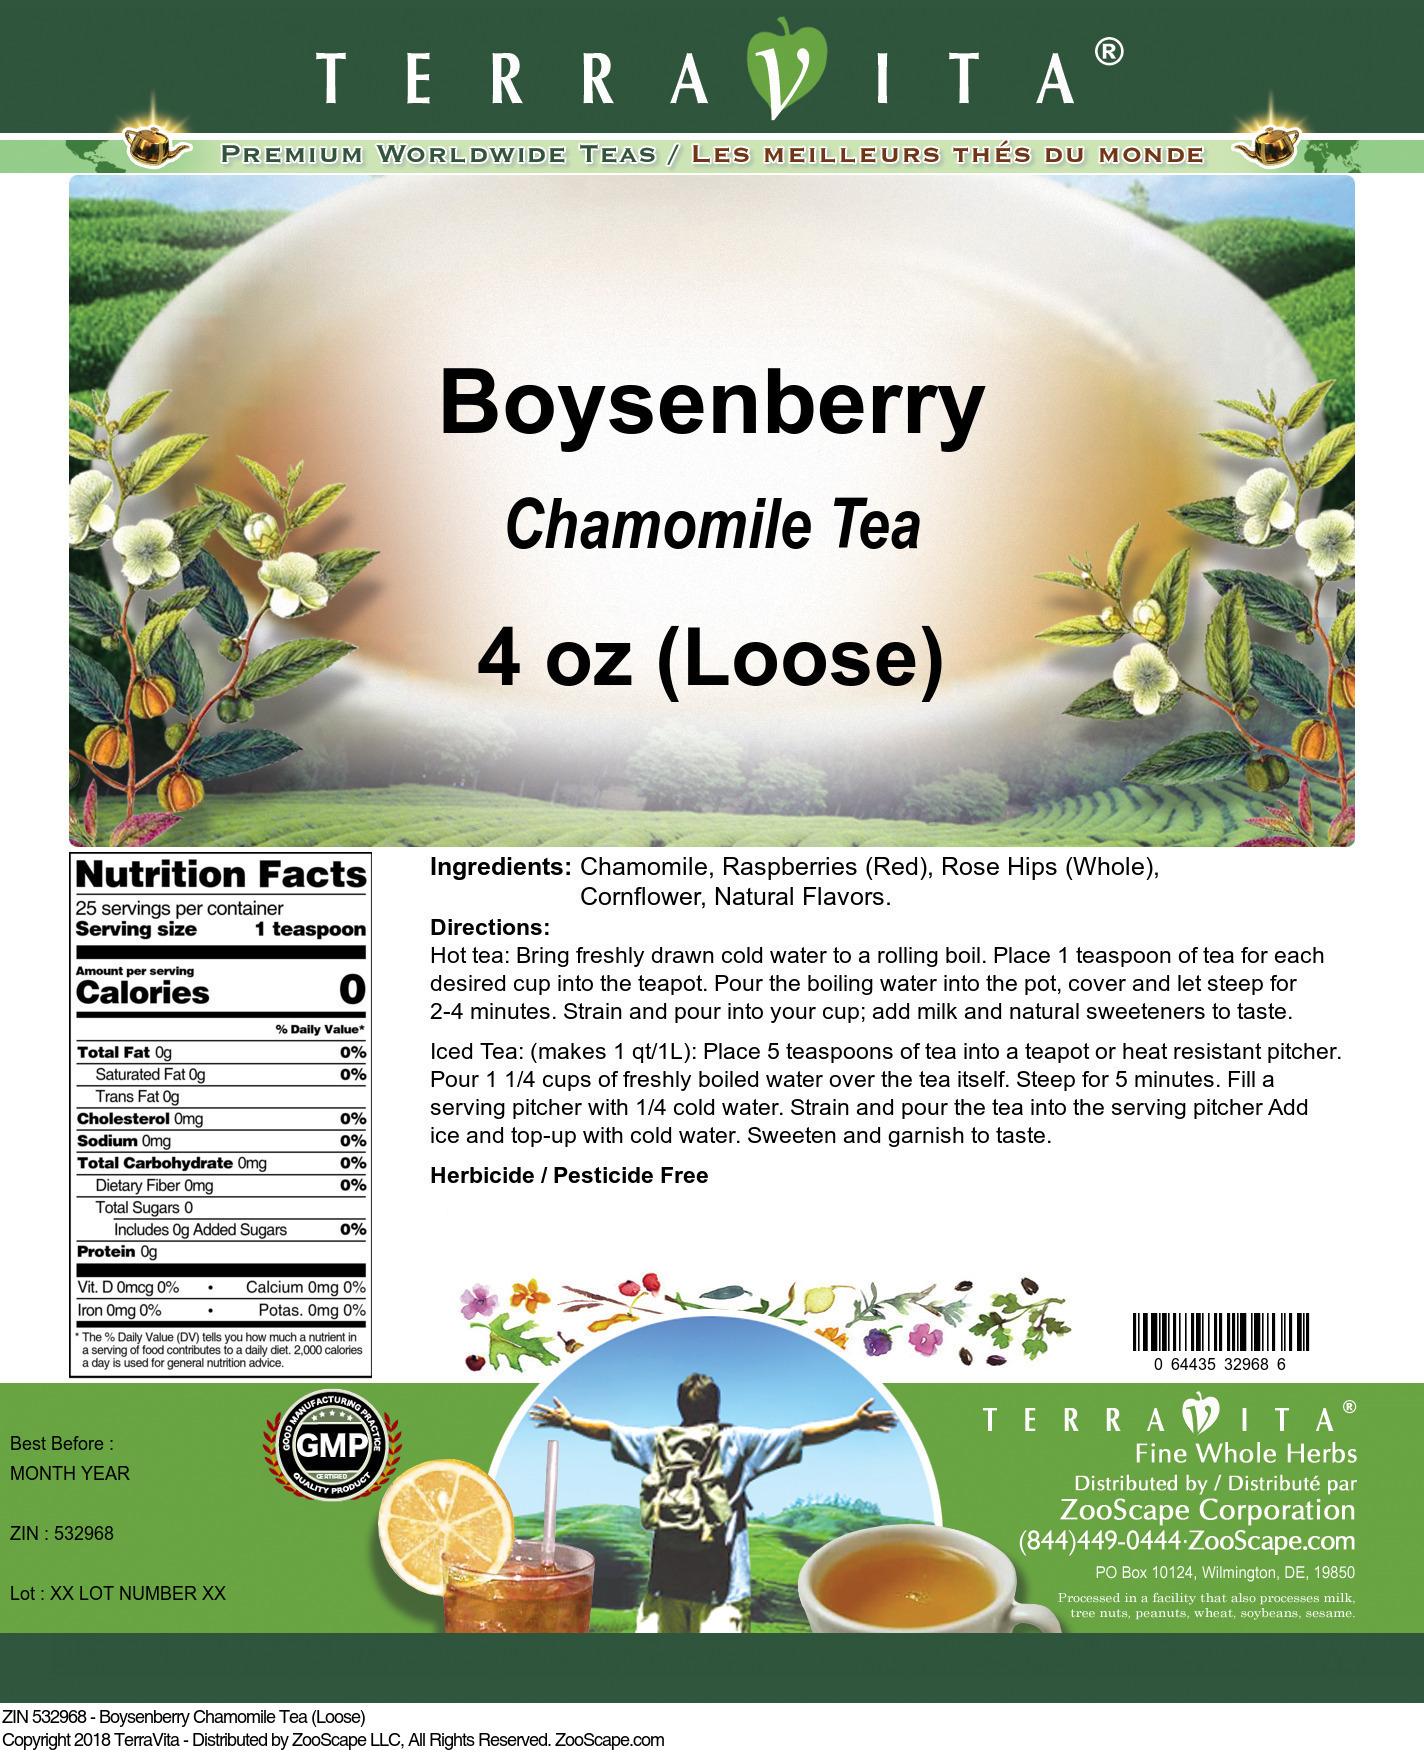 Boysenberry Chamomile Tea (Loose)